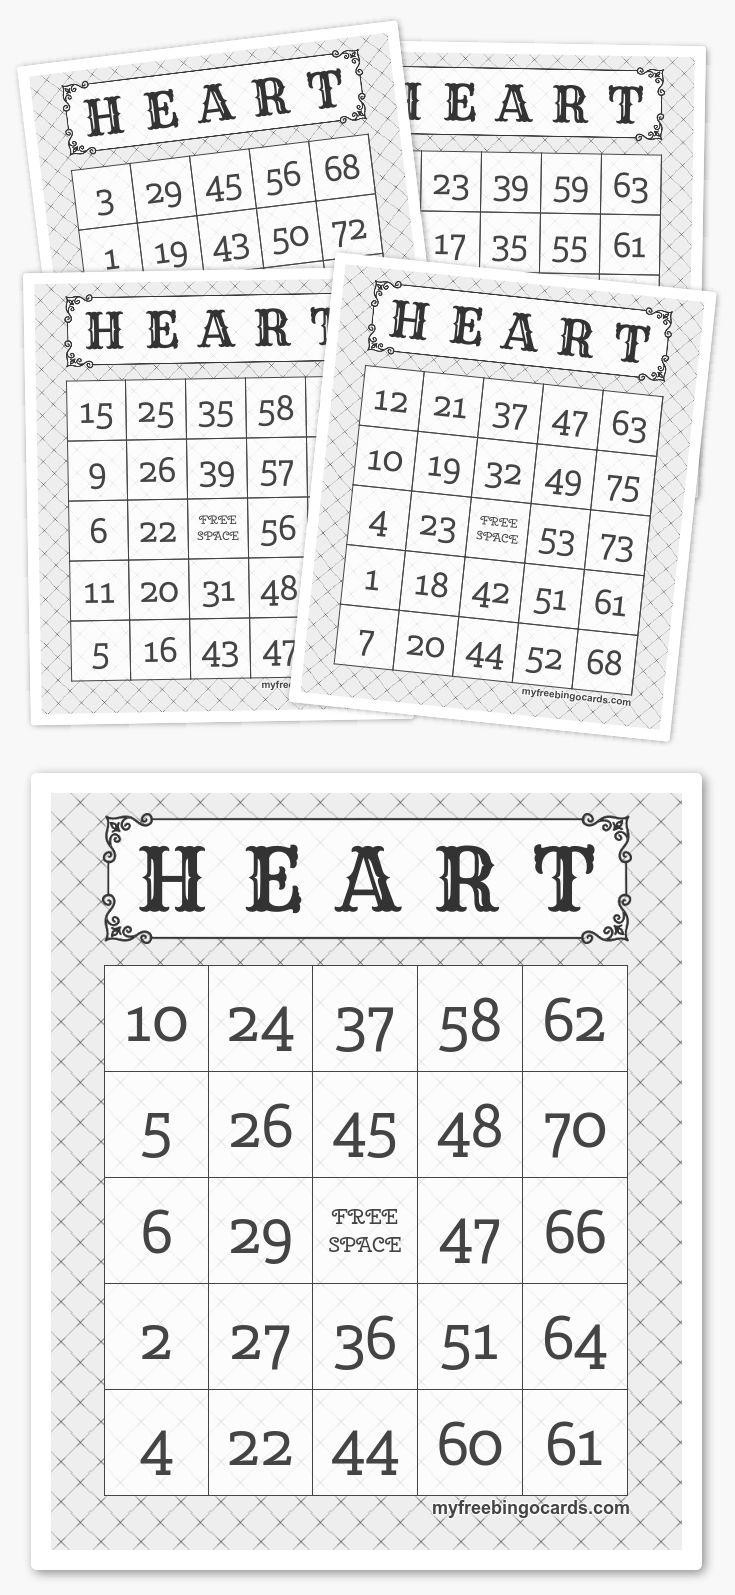 H E A R T BINGO Free printable bingo cards, Bingo cards